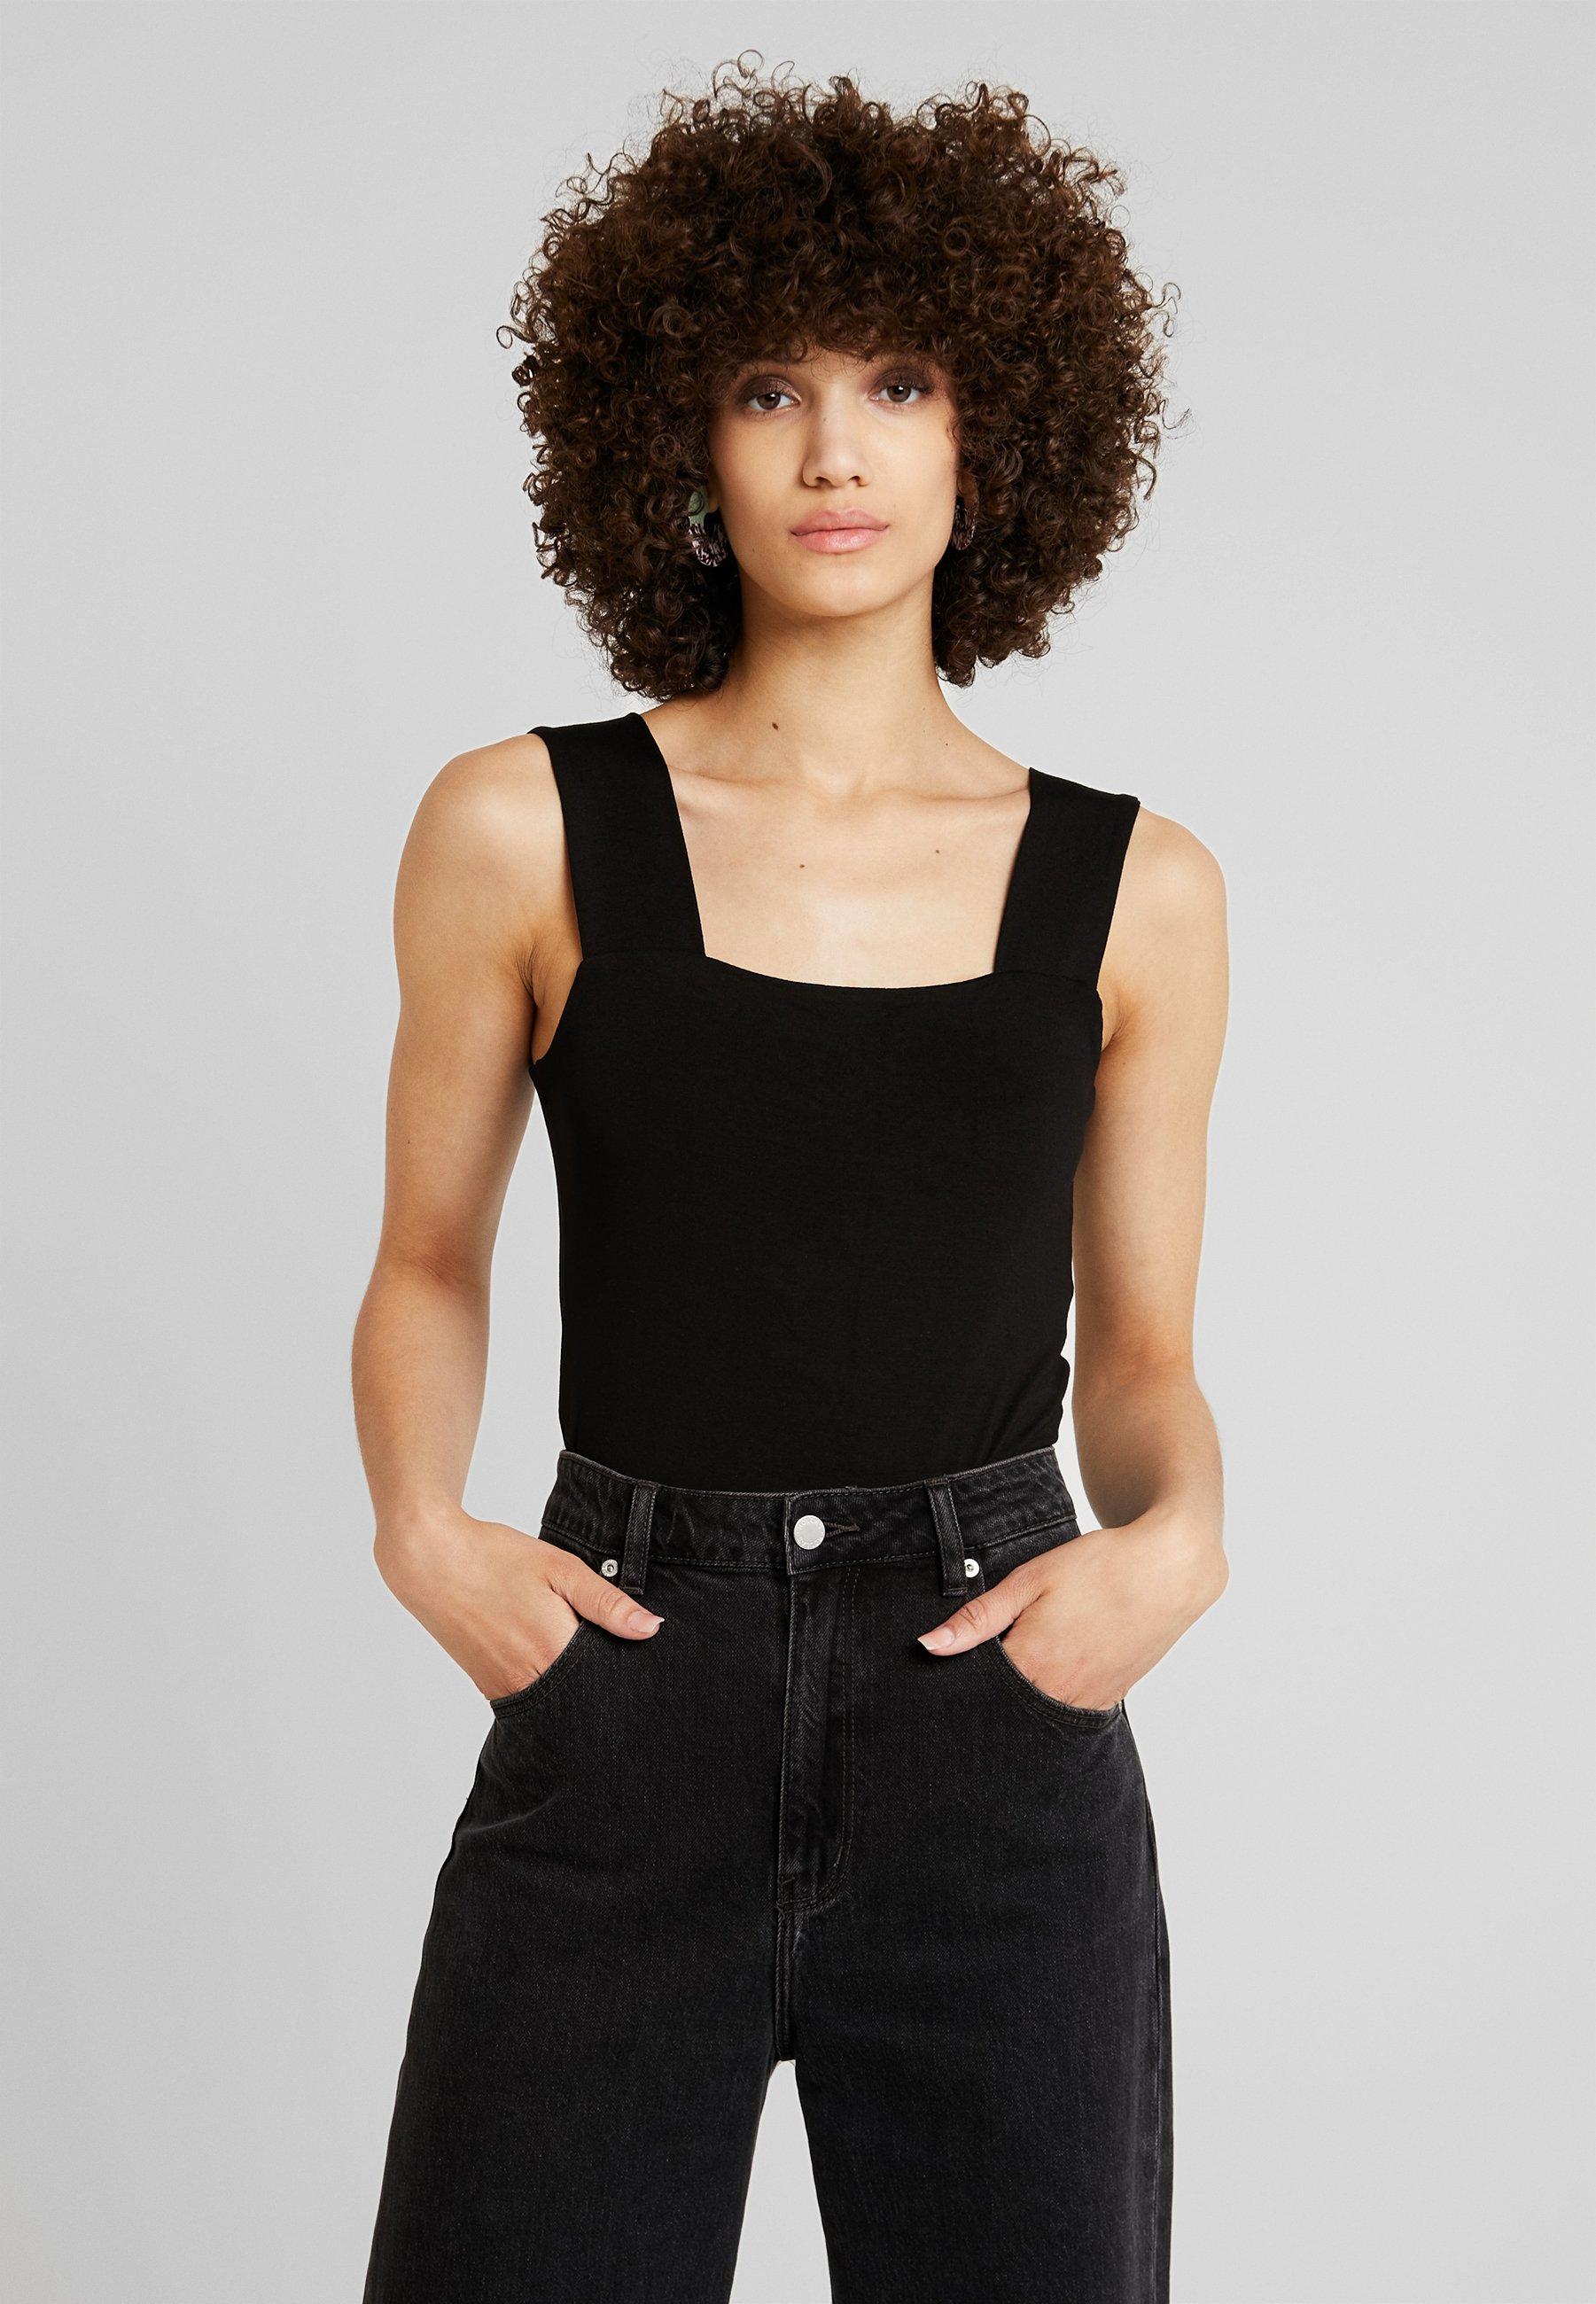 Neck BodysuitTop Square Perkins Dorothy Black IY76yfgbv